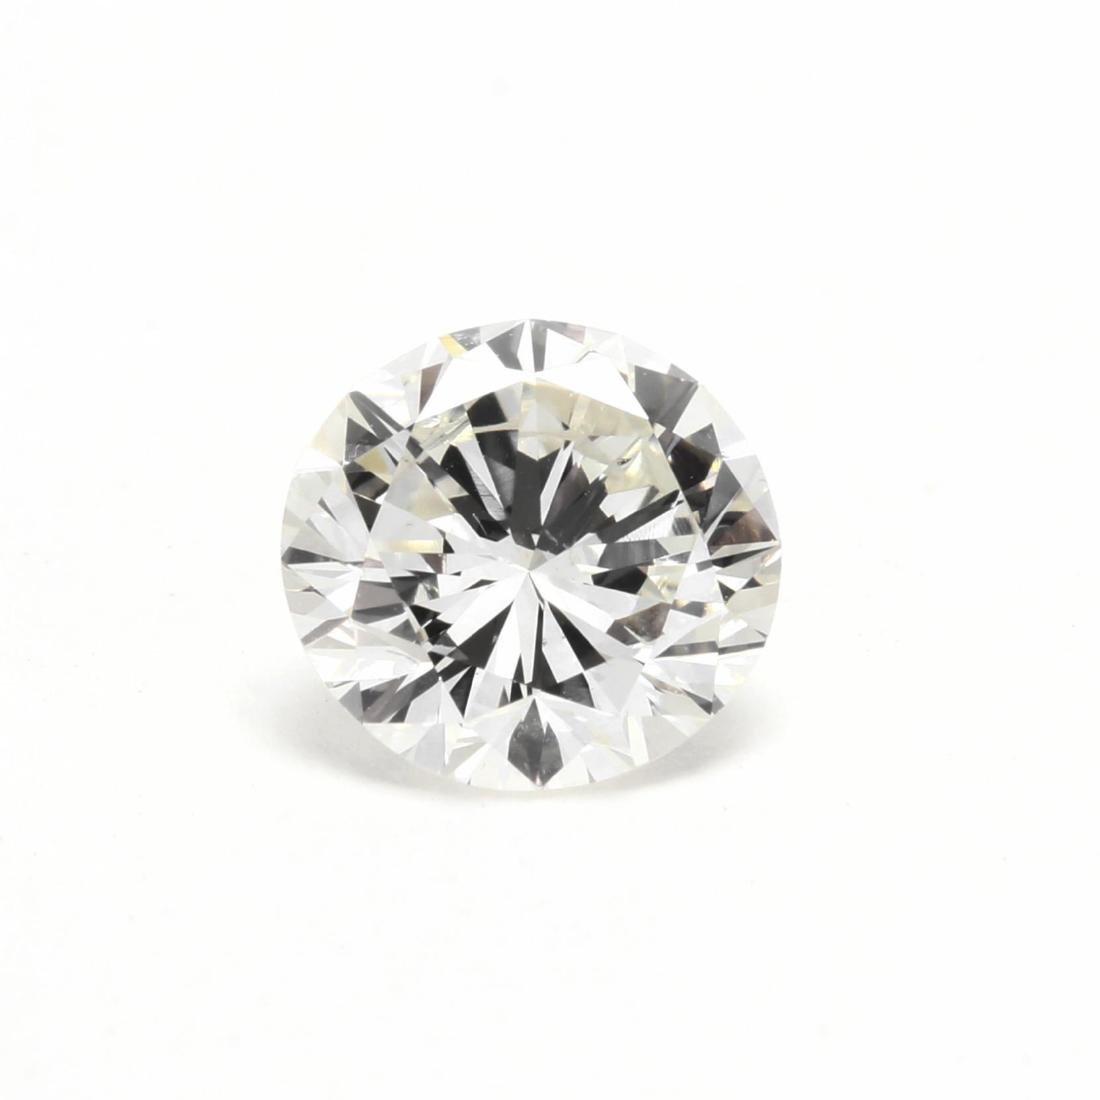 Unmounted Round Brilliant Cut Diamond